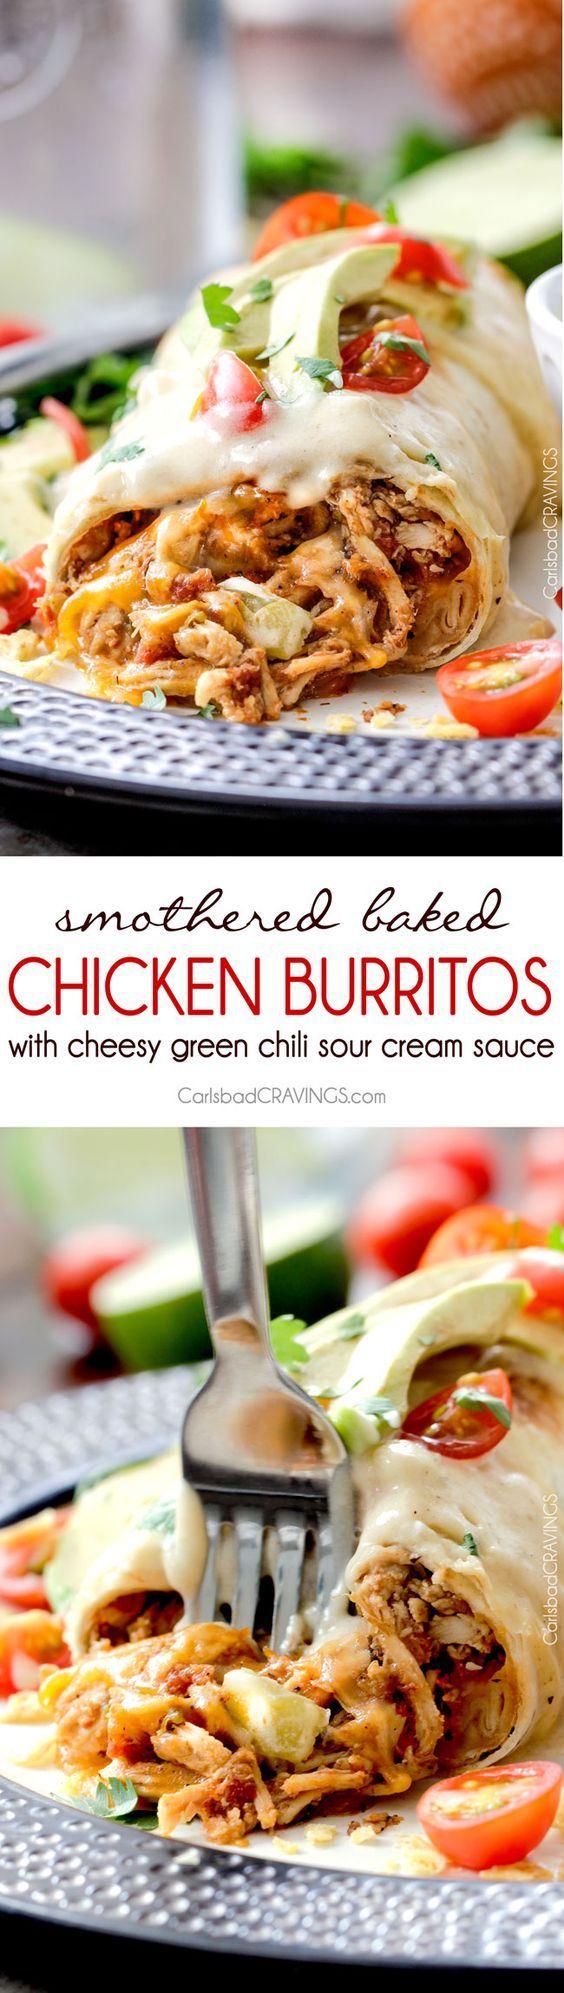 "D R O O L I N G --> Smothered Baked Chicken Burritos AKA ""skinny…"